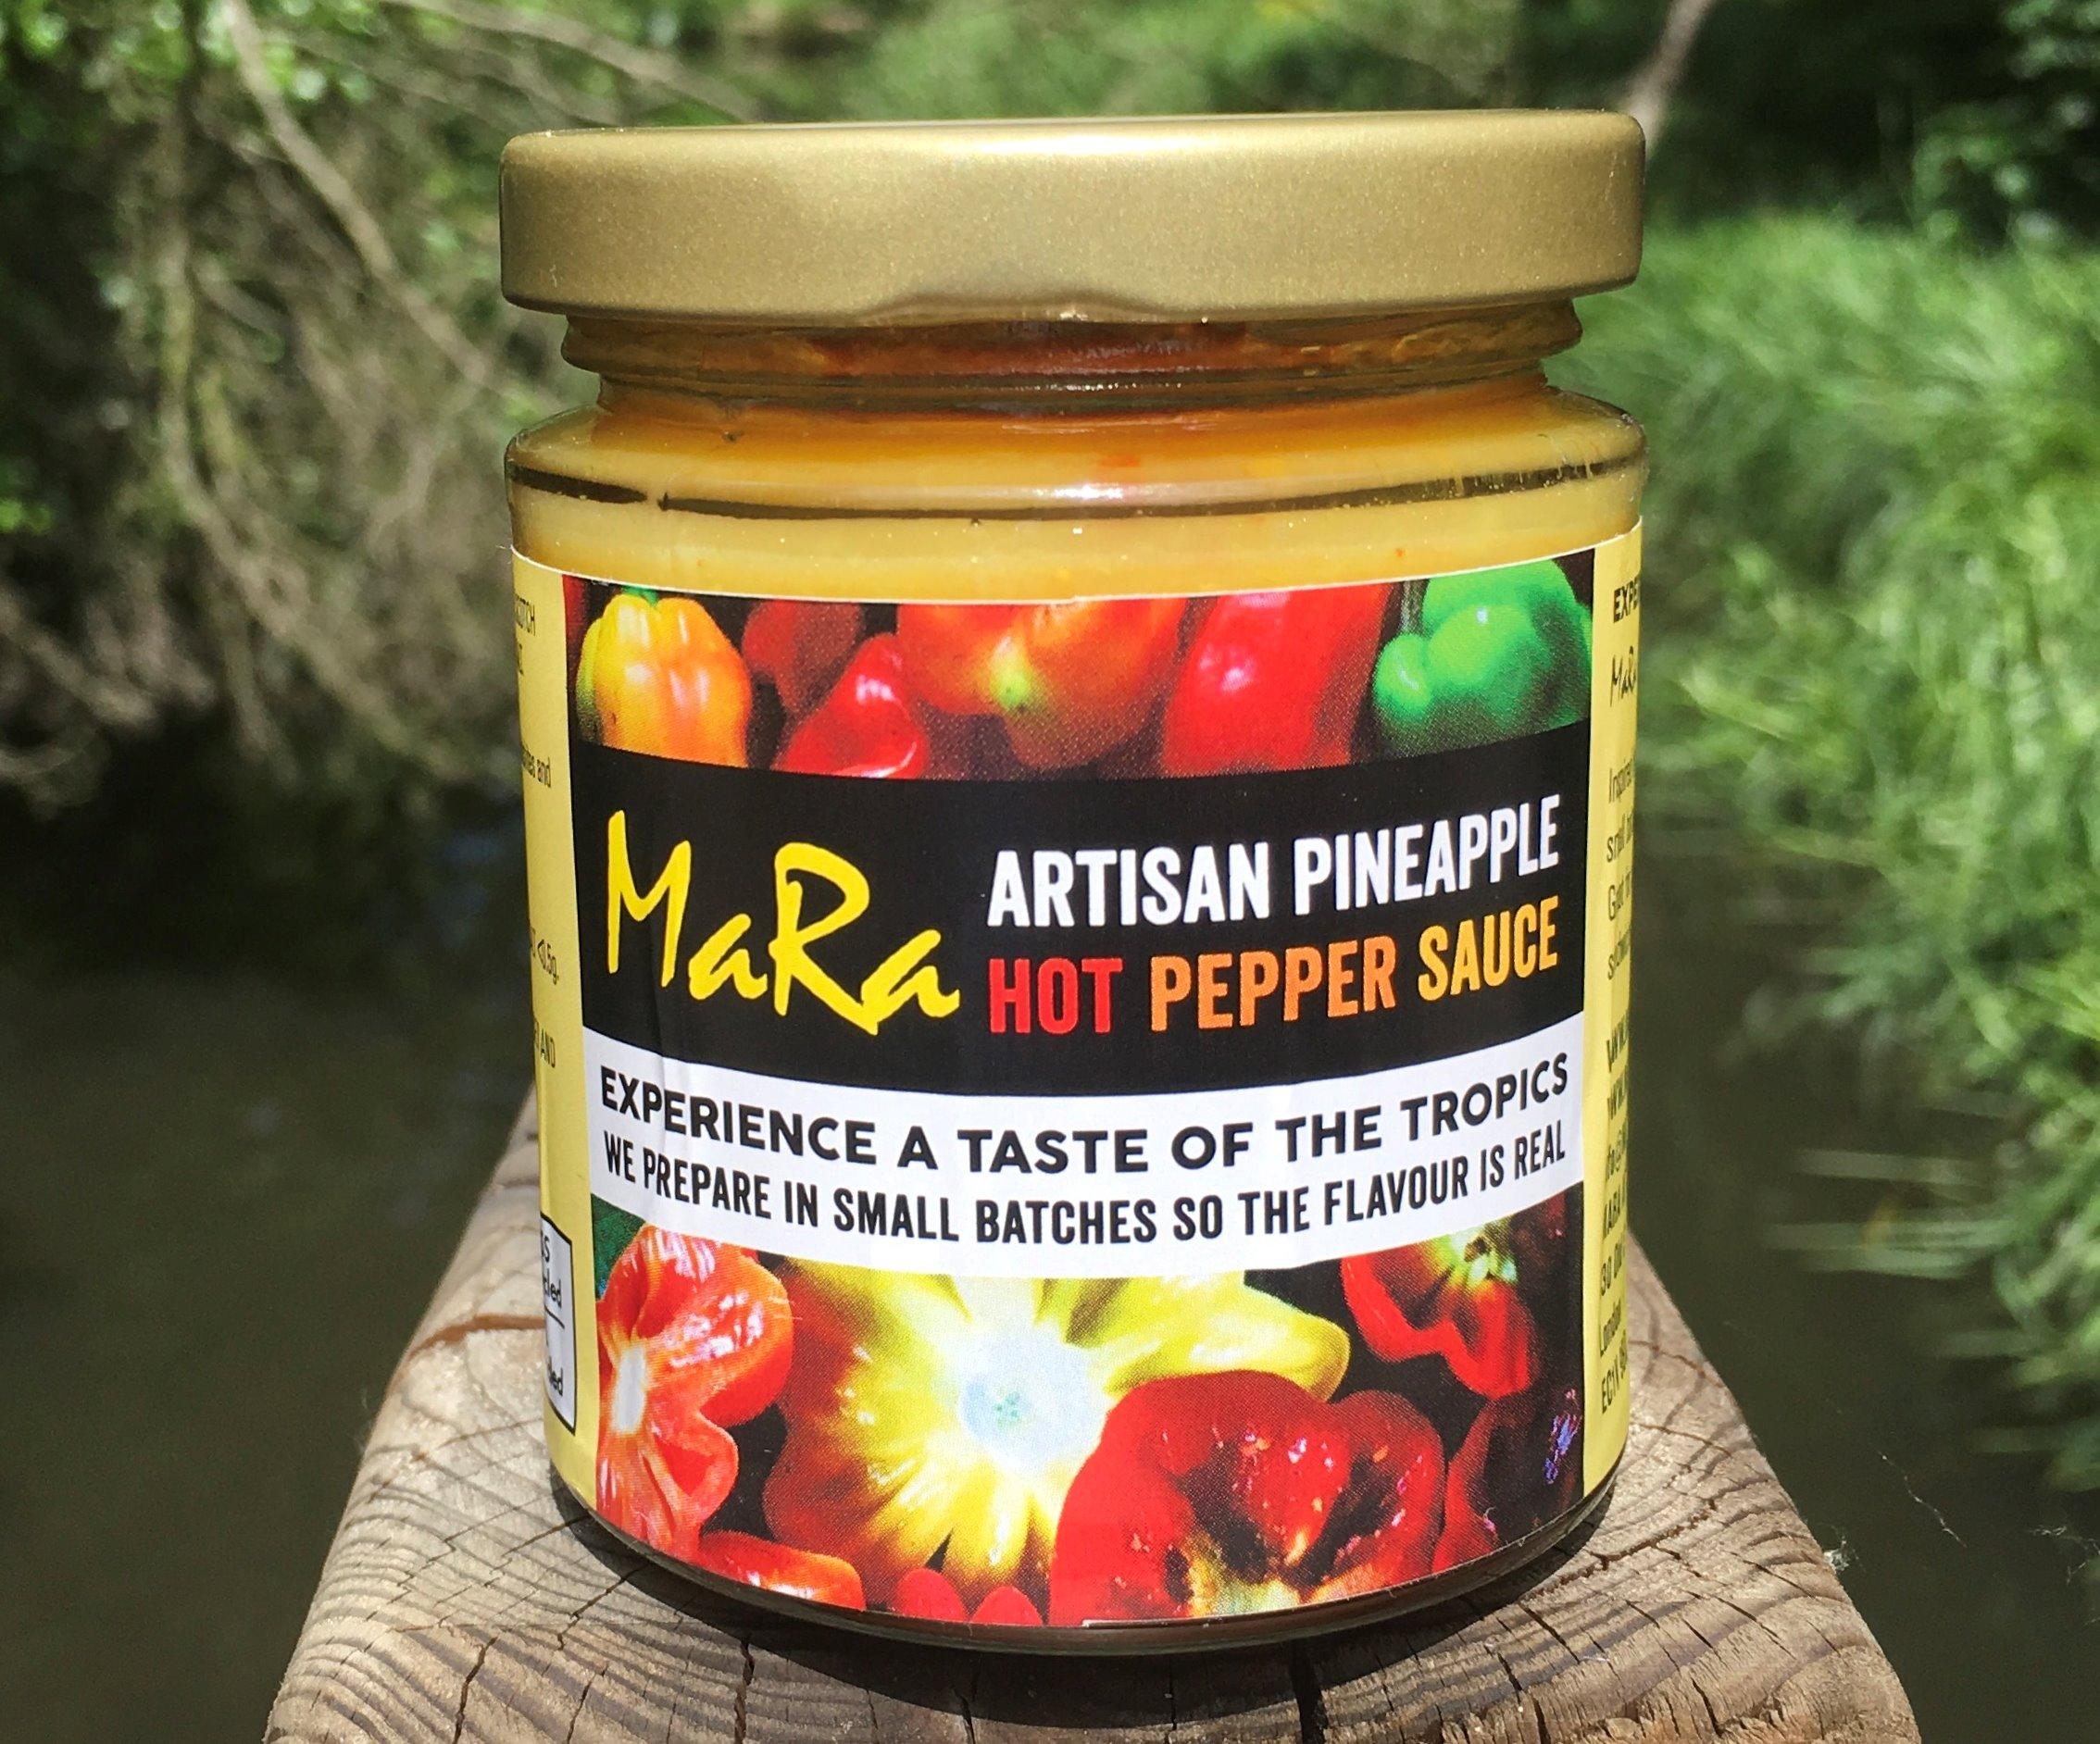 MaRa artisan pineapple hot pepper sa